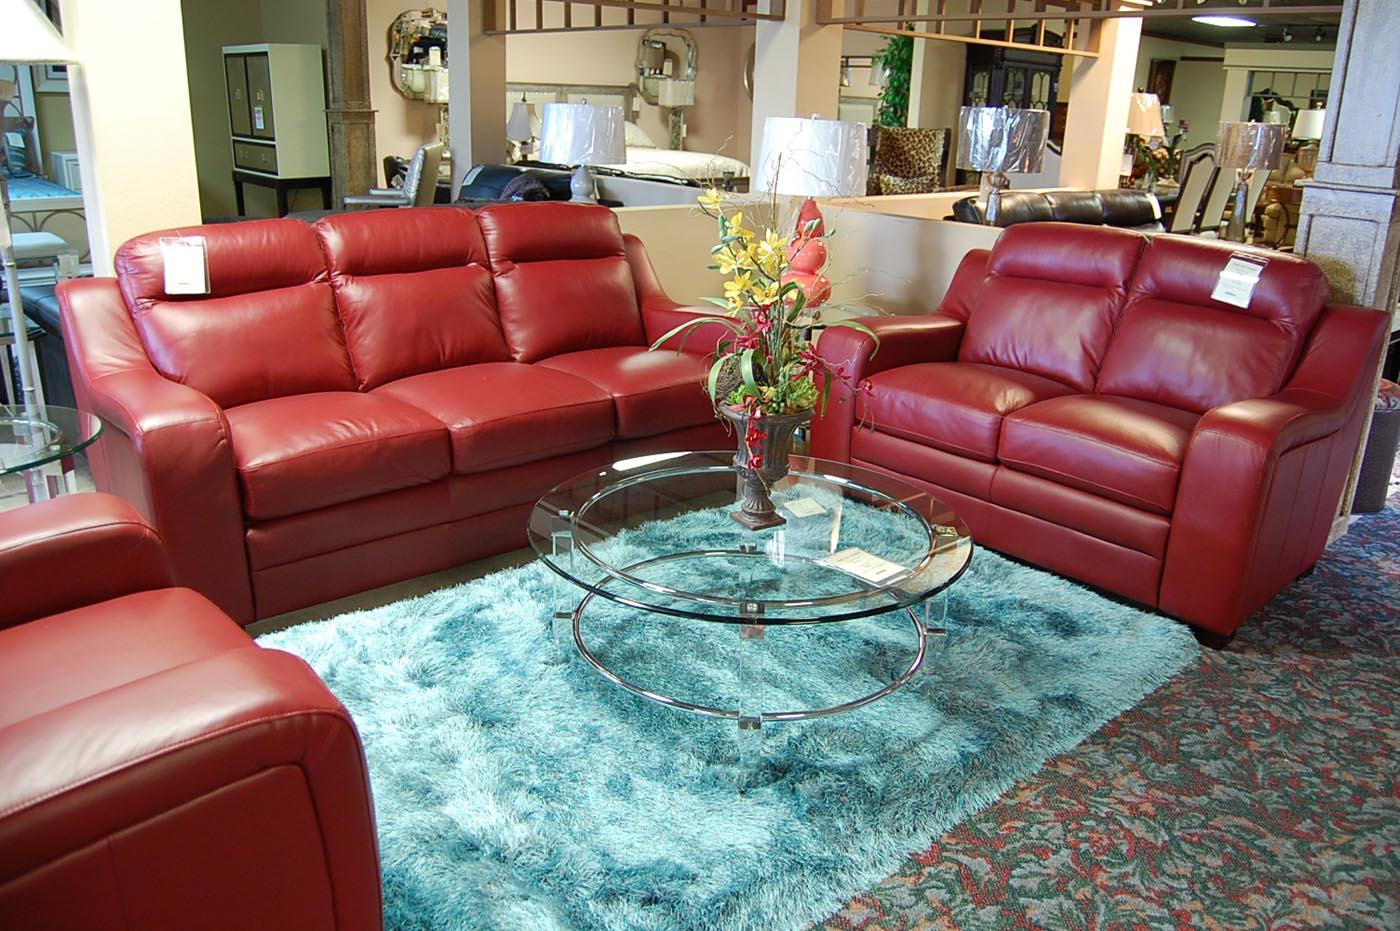 leather living room le57 leather living room le56